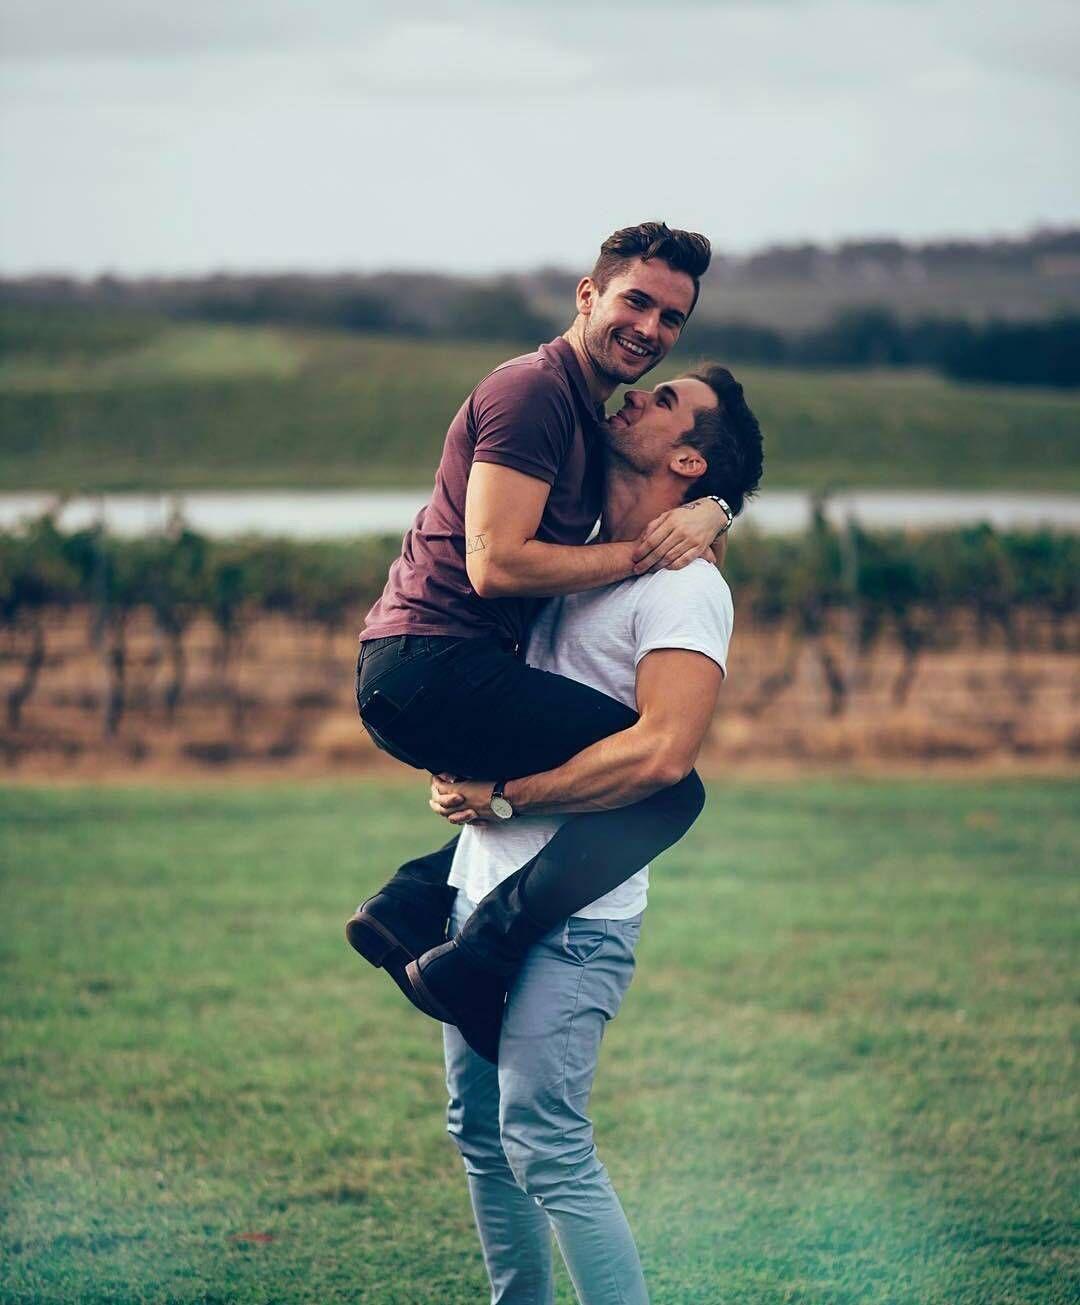 Gay dating on instagram